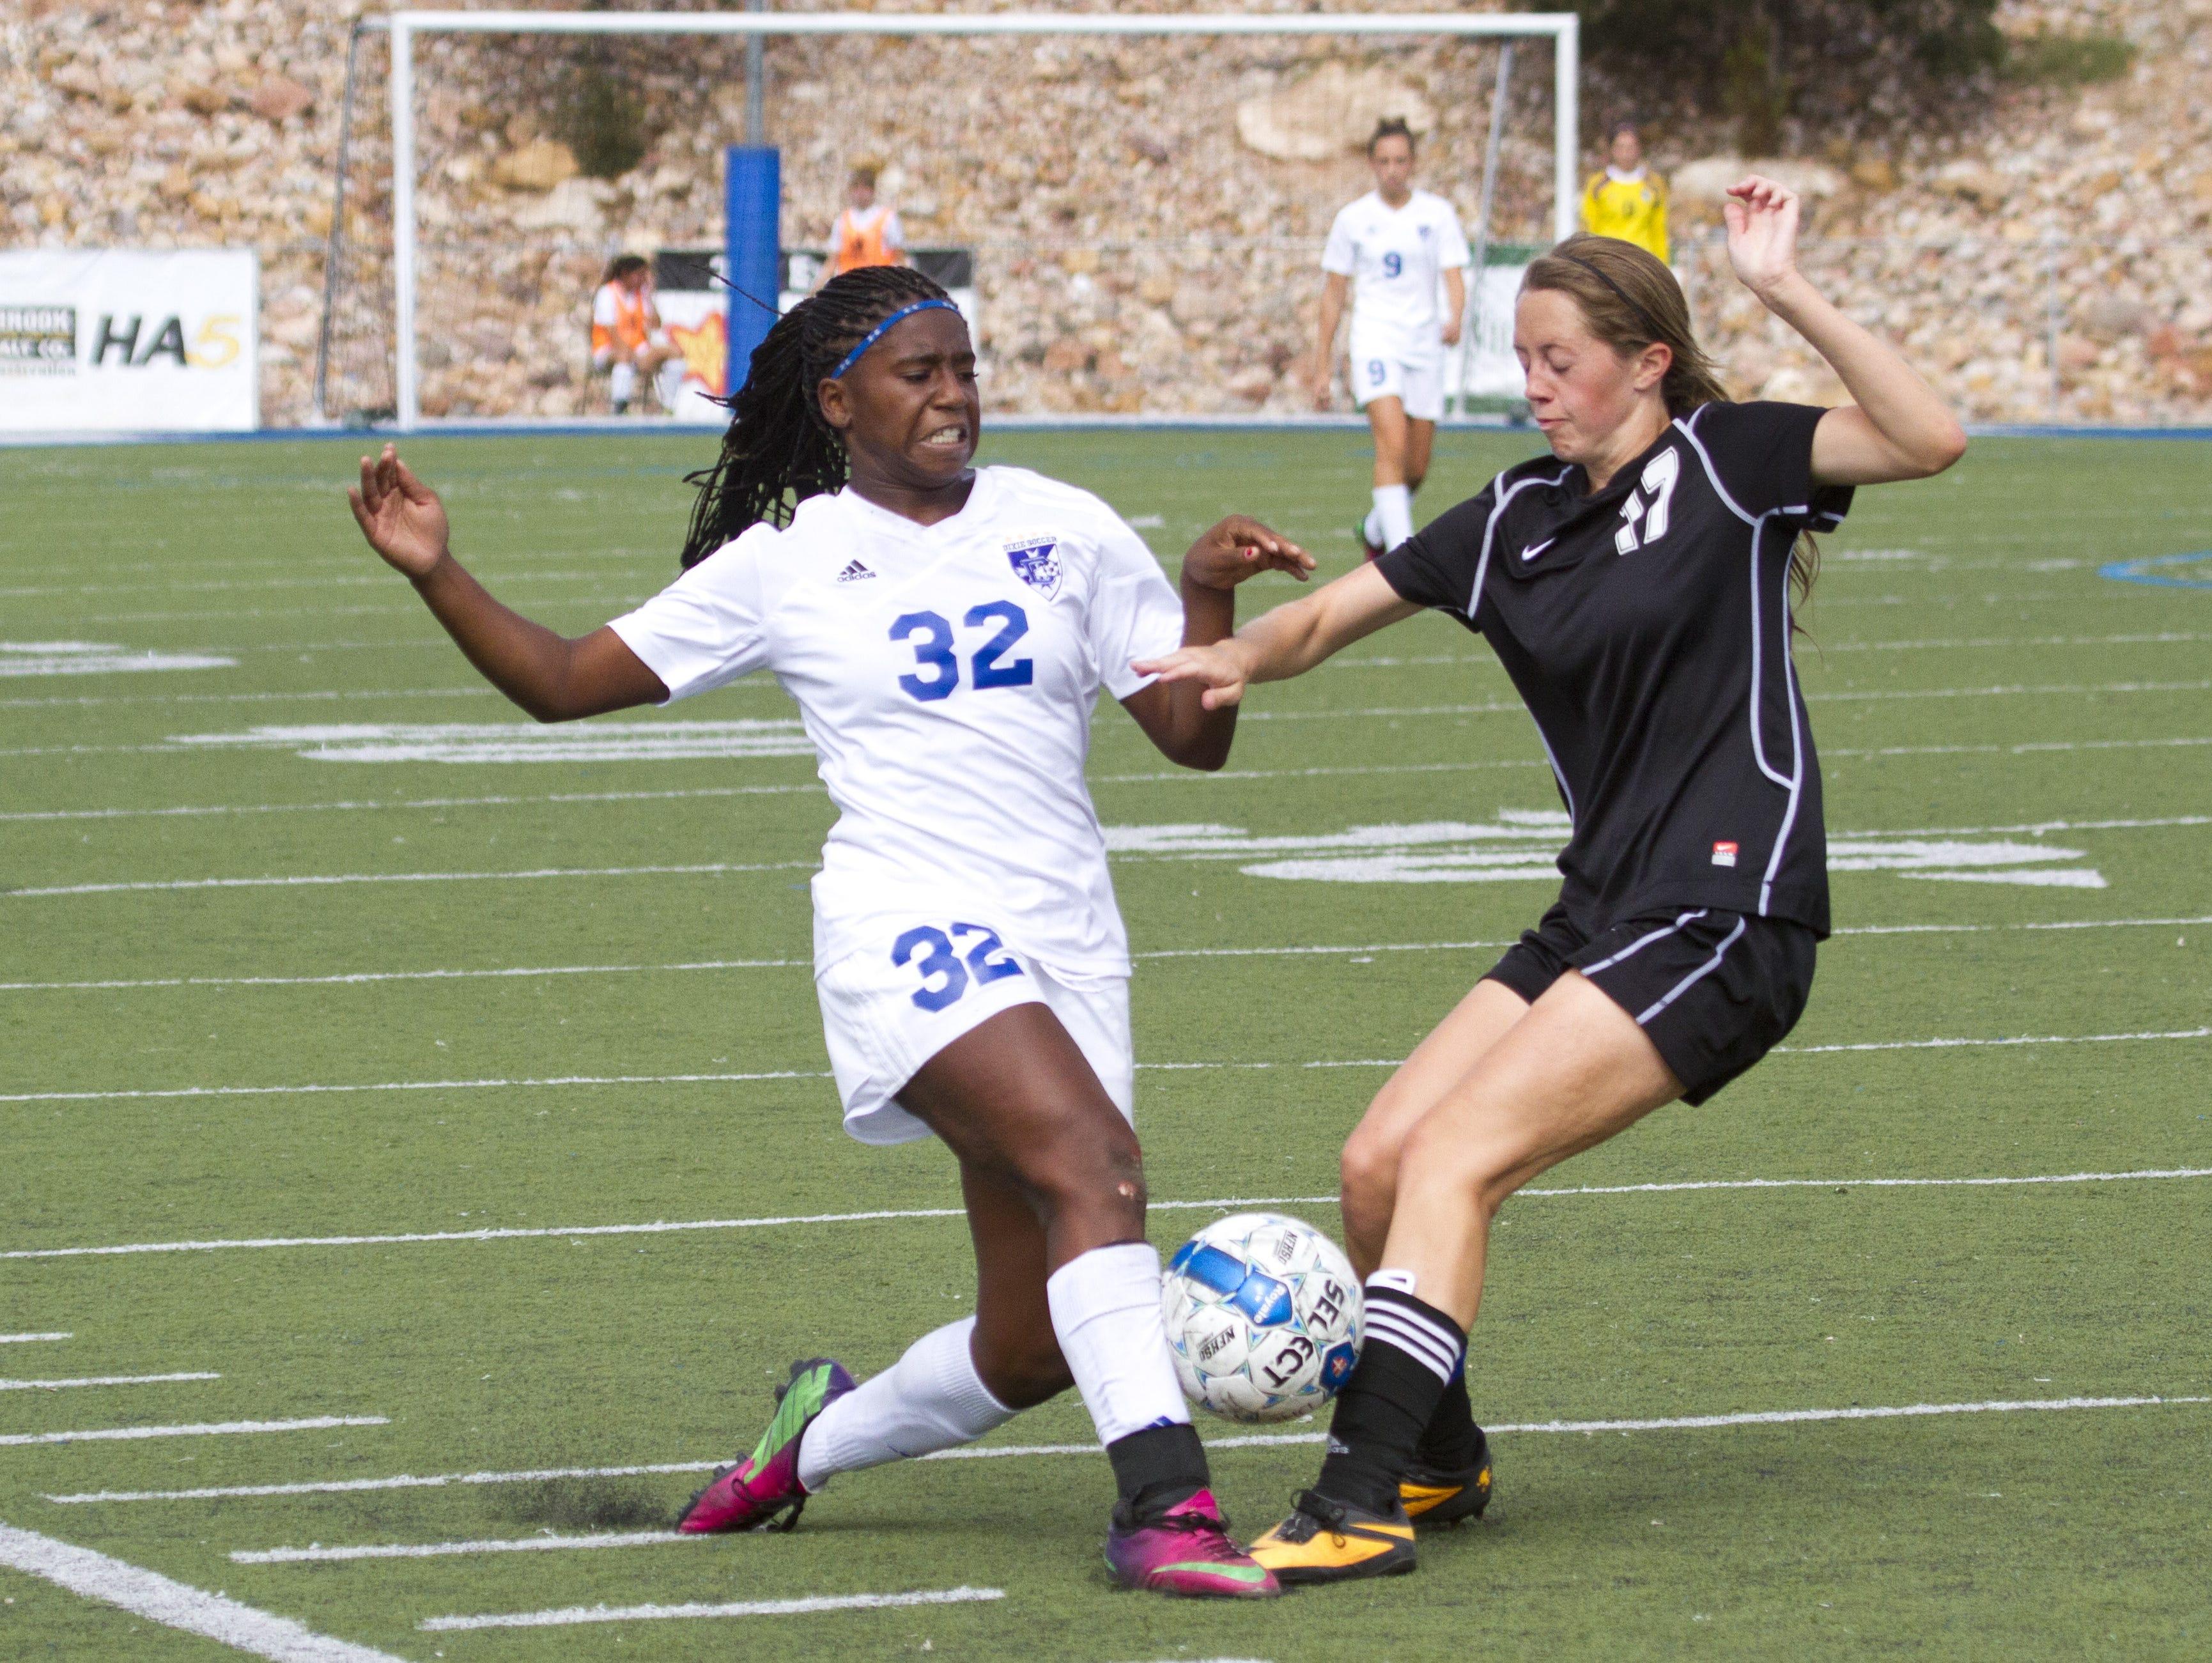 Dixie forward Starlee Woodbury shoots around Stansbury defender Erika Lakin Saturday, Oct. 18, 2014.